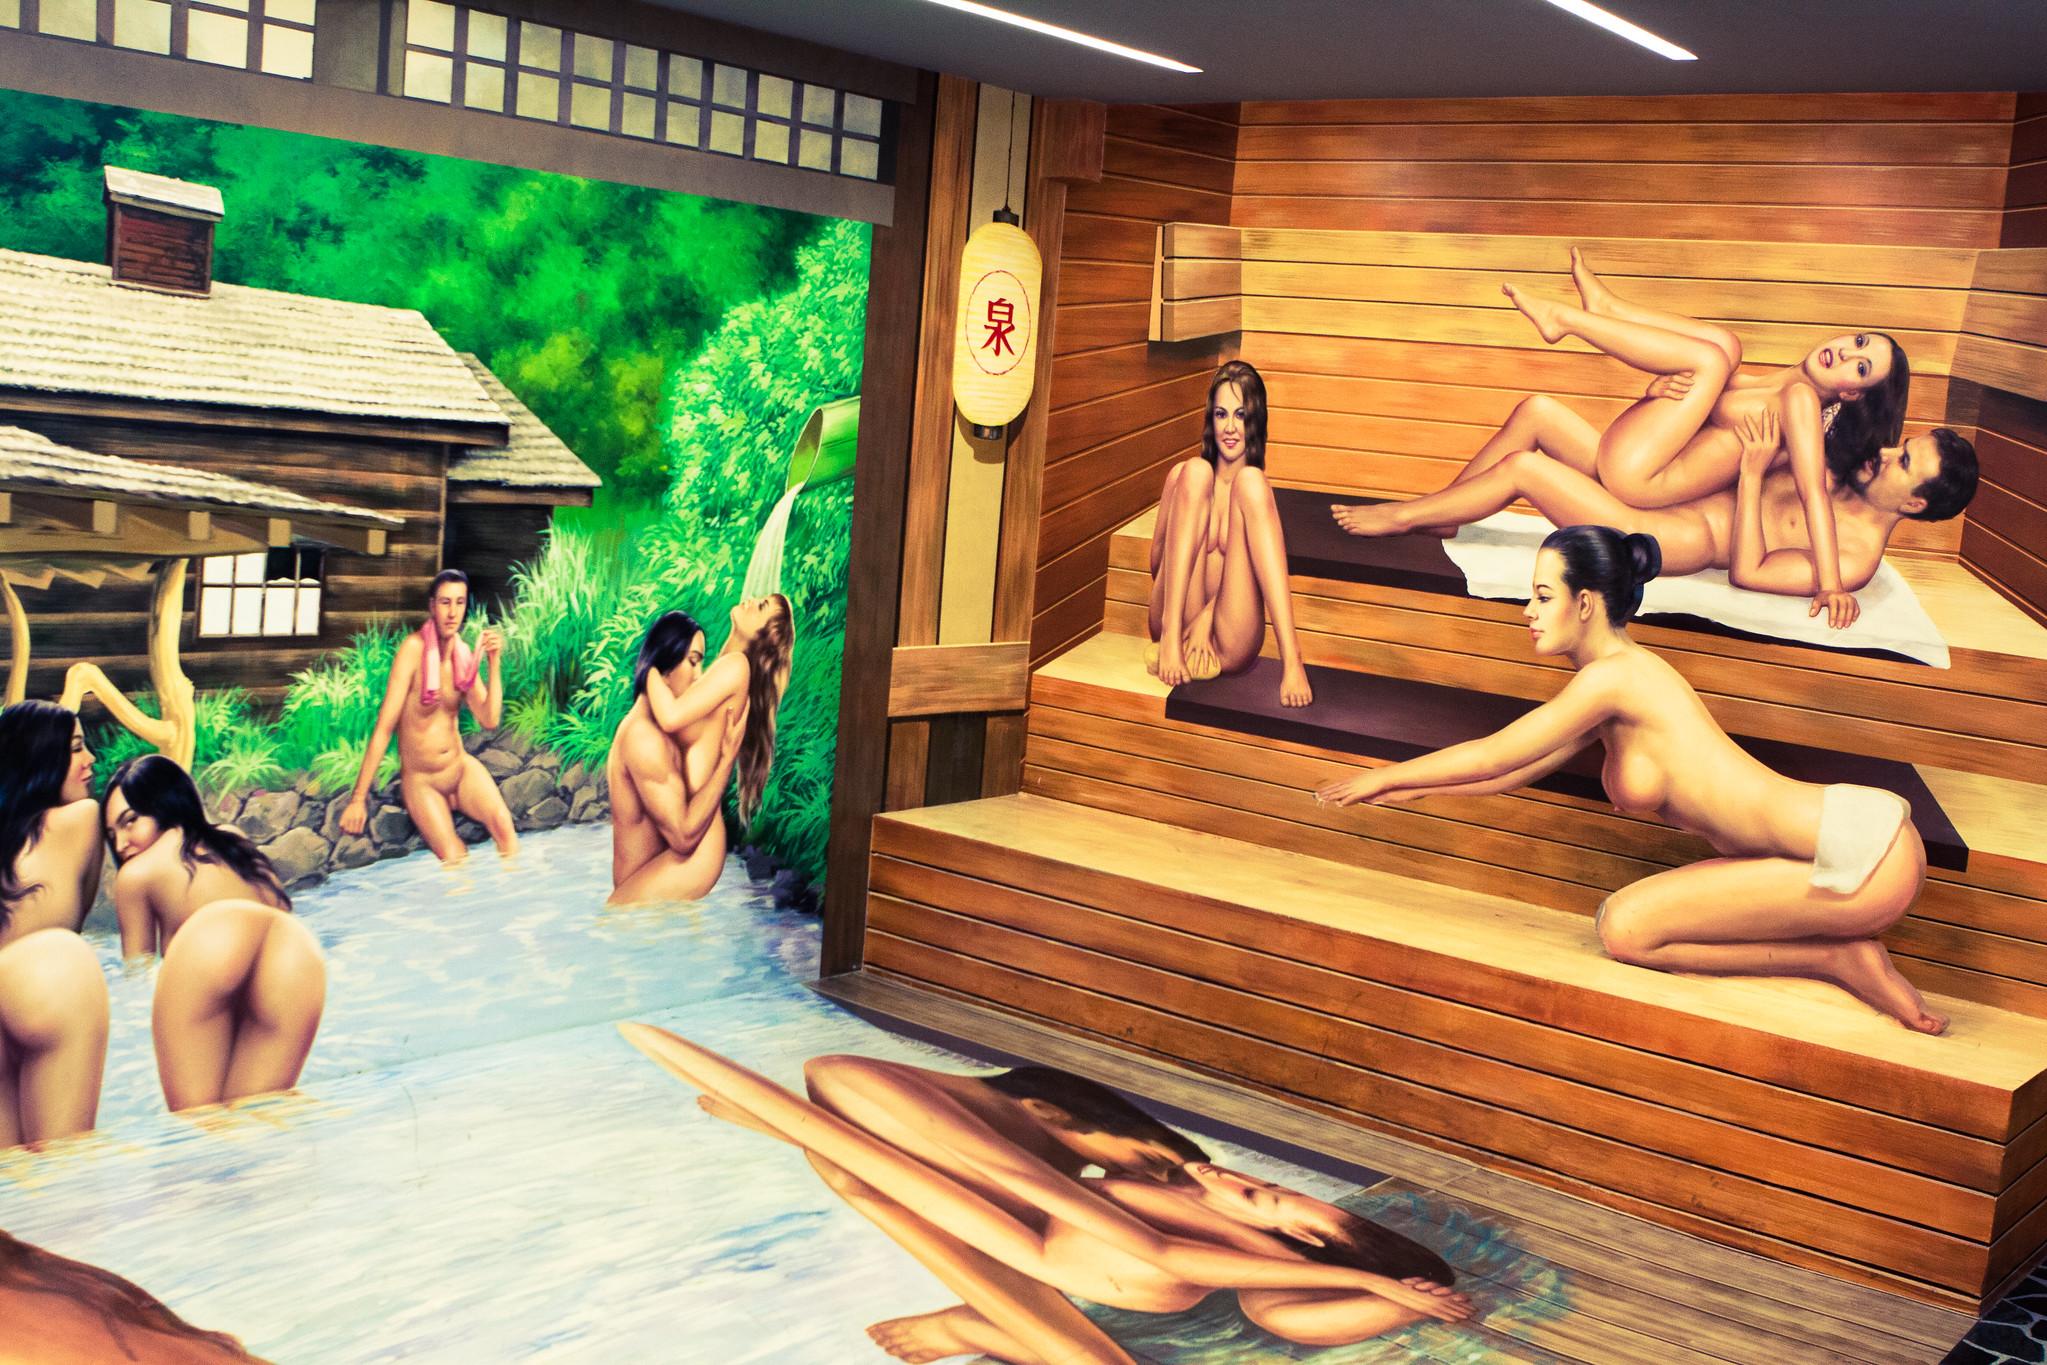 Erotic Heritage Museum - Official Site